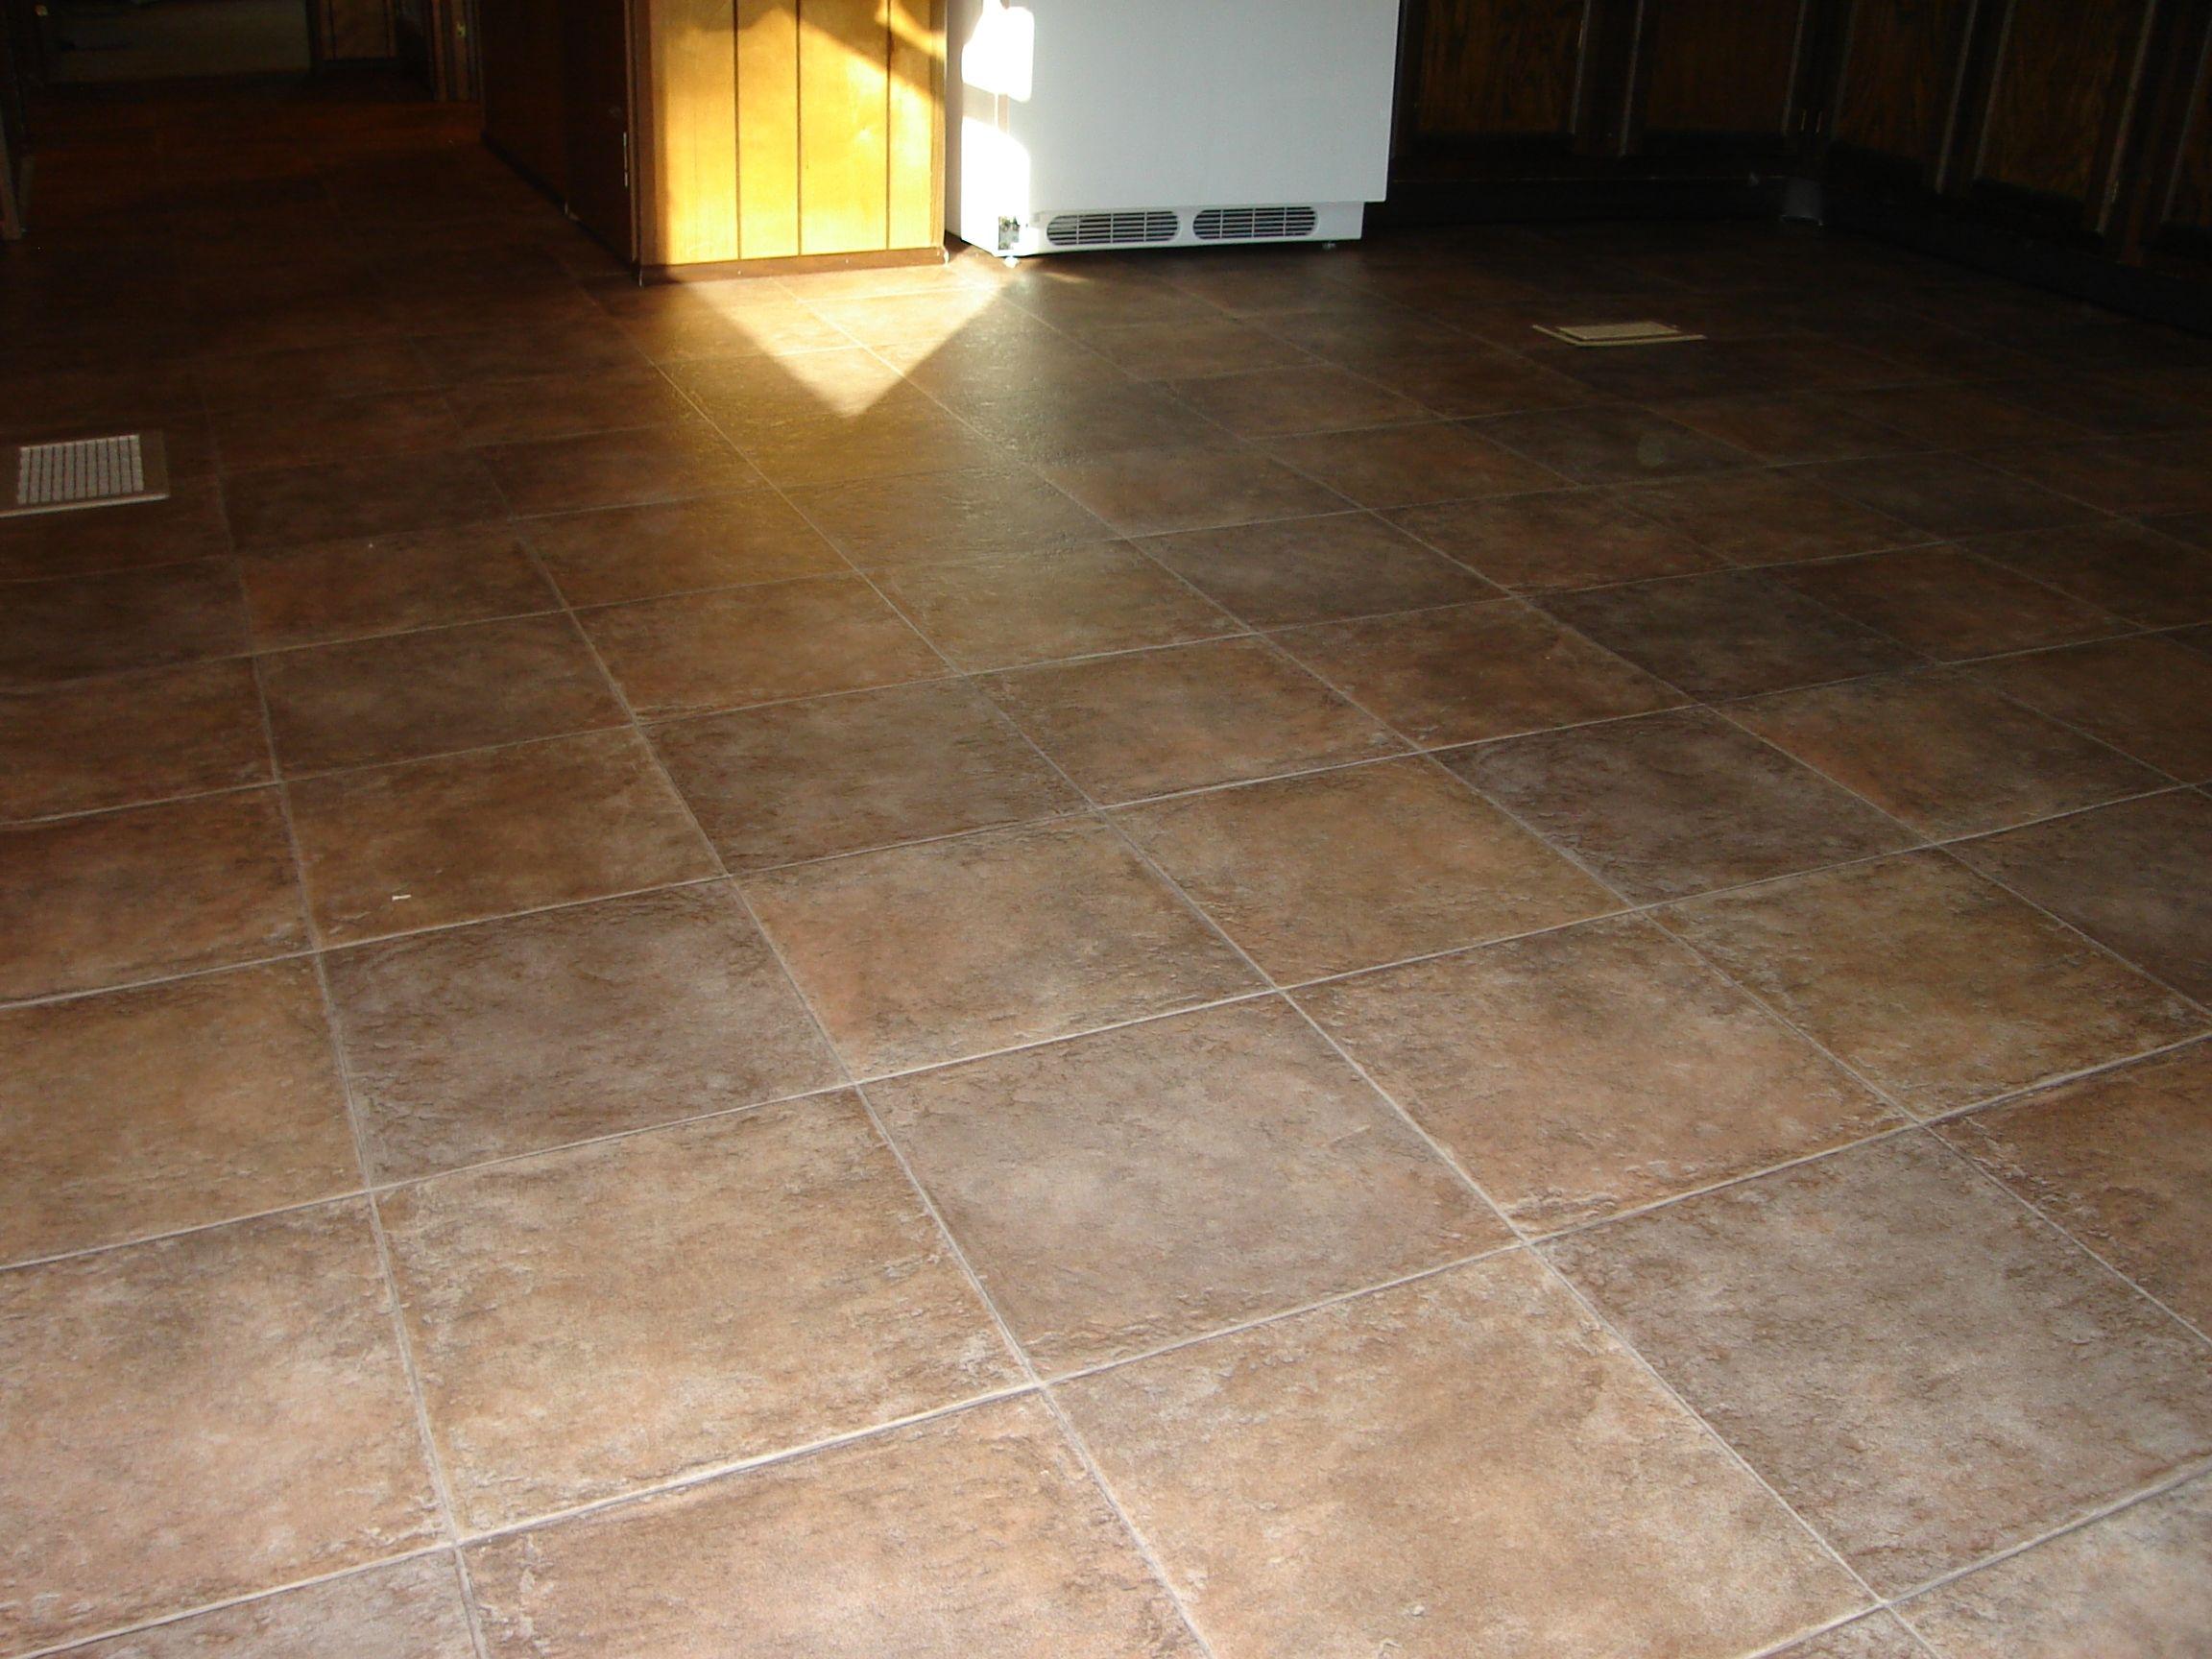 Interlocking Vinyl Floor Tiles Kitchen Httpnextsoftcom - Interlocking vinyl flooring tiles